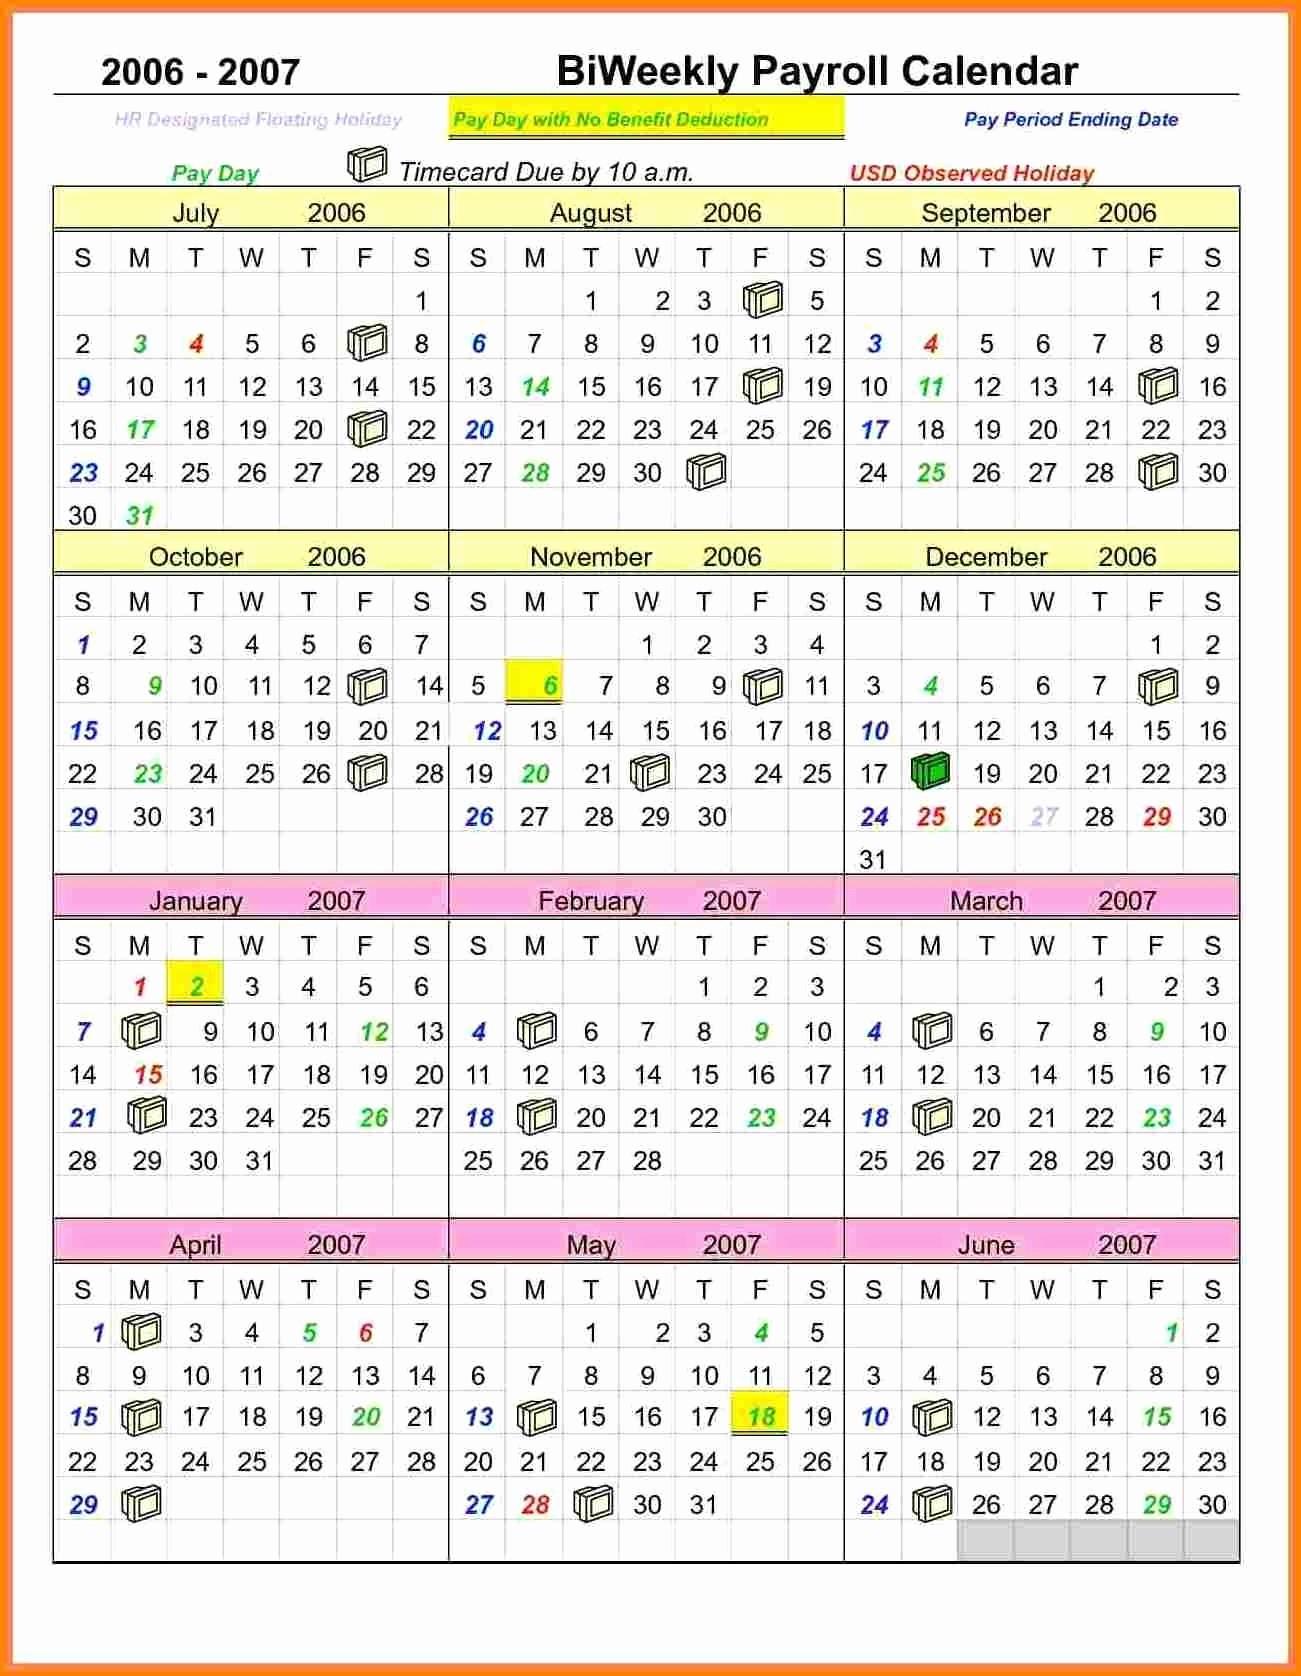 Adp 2019 Payroll Calendar Semi Monthly | Payroll Calendars-Template For Semi Monthly Payroll Calendar 2020